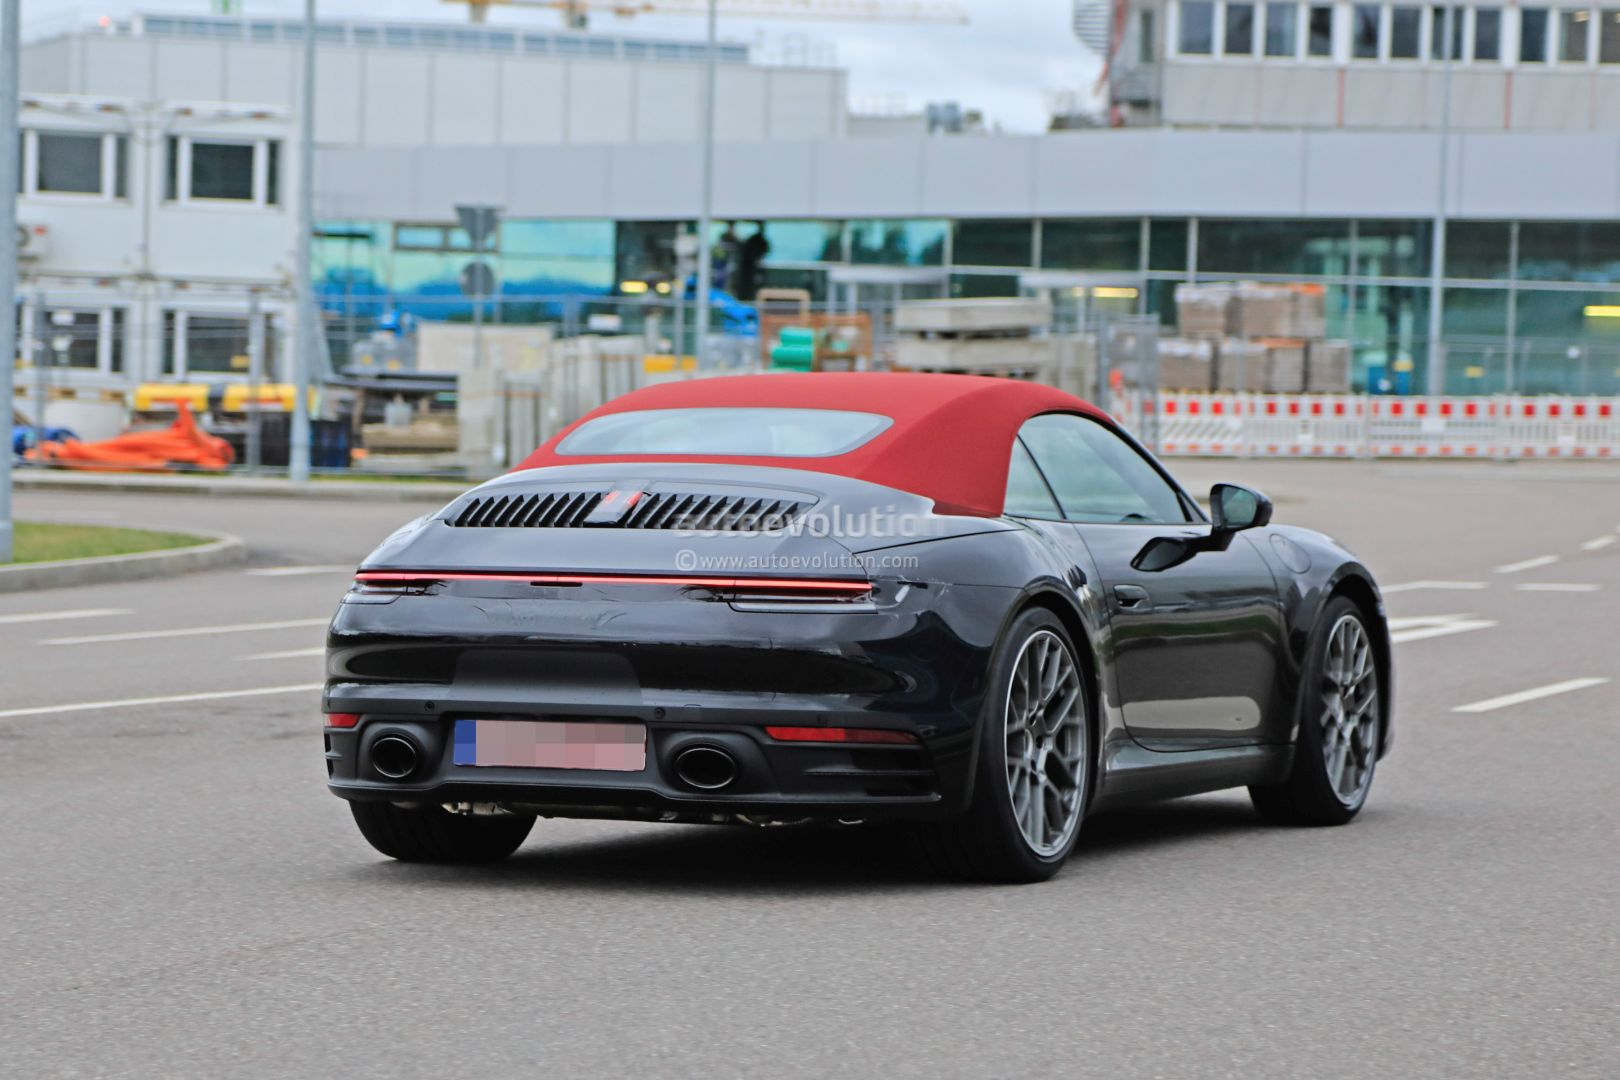 2020 Porsche 911 Cabriolet Shows New Roof Gt3 Cabriolet